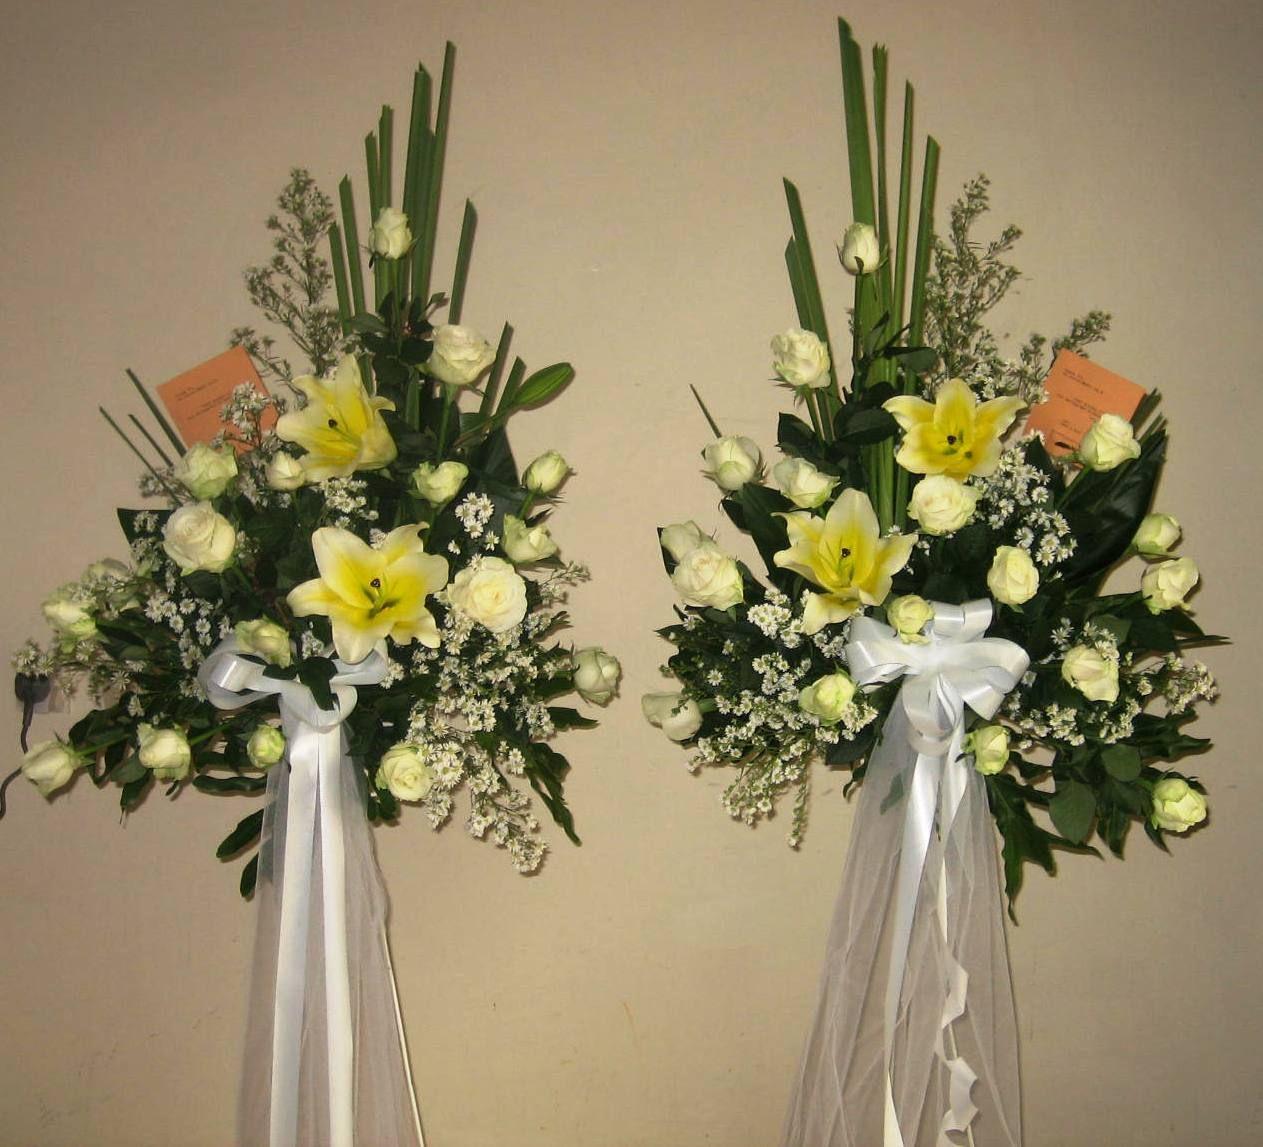 Foto Rangkaian Bunga Segar Rangkaian Bunga Segar Galeribunga Cilegon Rangkaian Bunga Segar Toko Bunga Di Bogor Online Mu Rangkaian Bunga Bunga Bunga Sakura